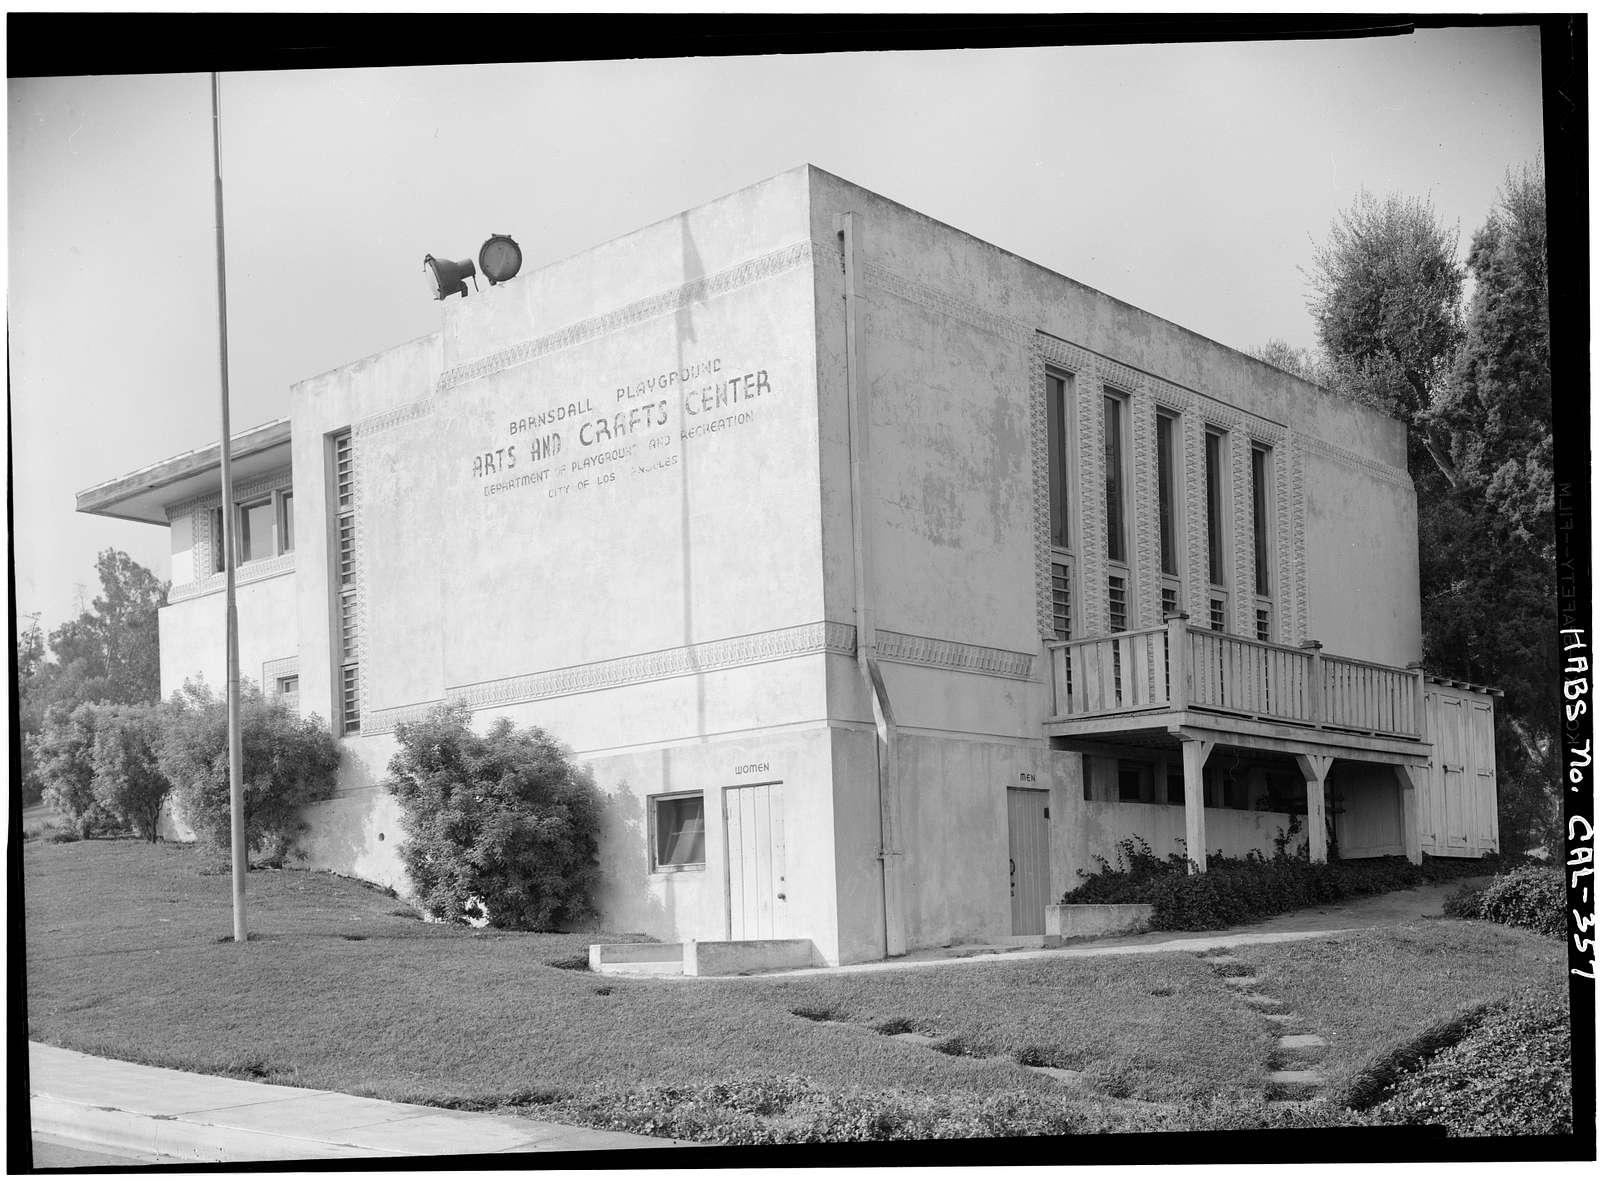 Barnsdall Park, Residence 'A', 4800 Hollywood Boulevard, Los Angeles, Los Angeles County, CA